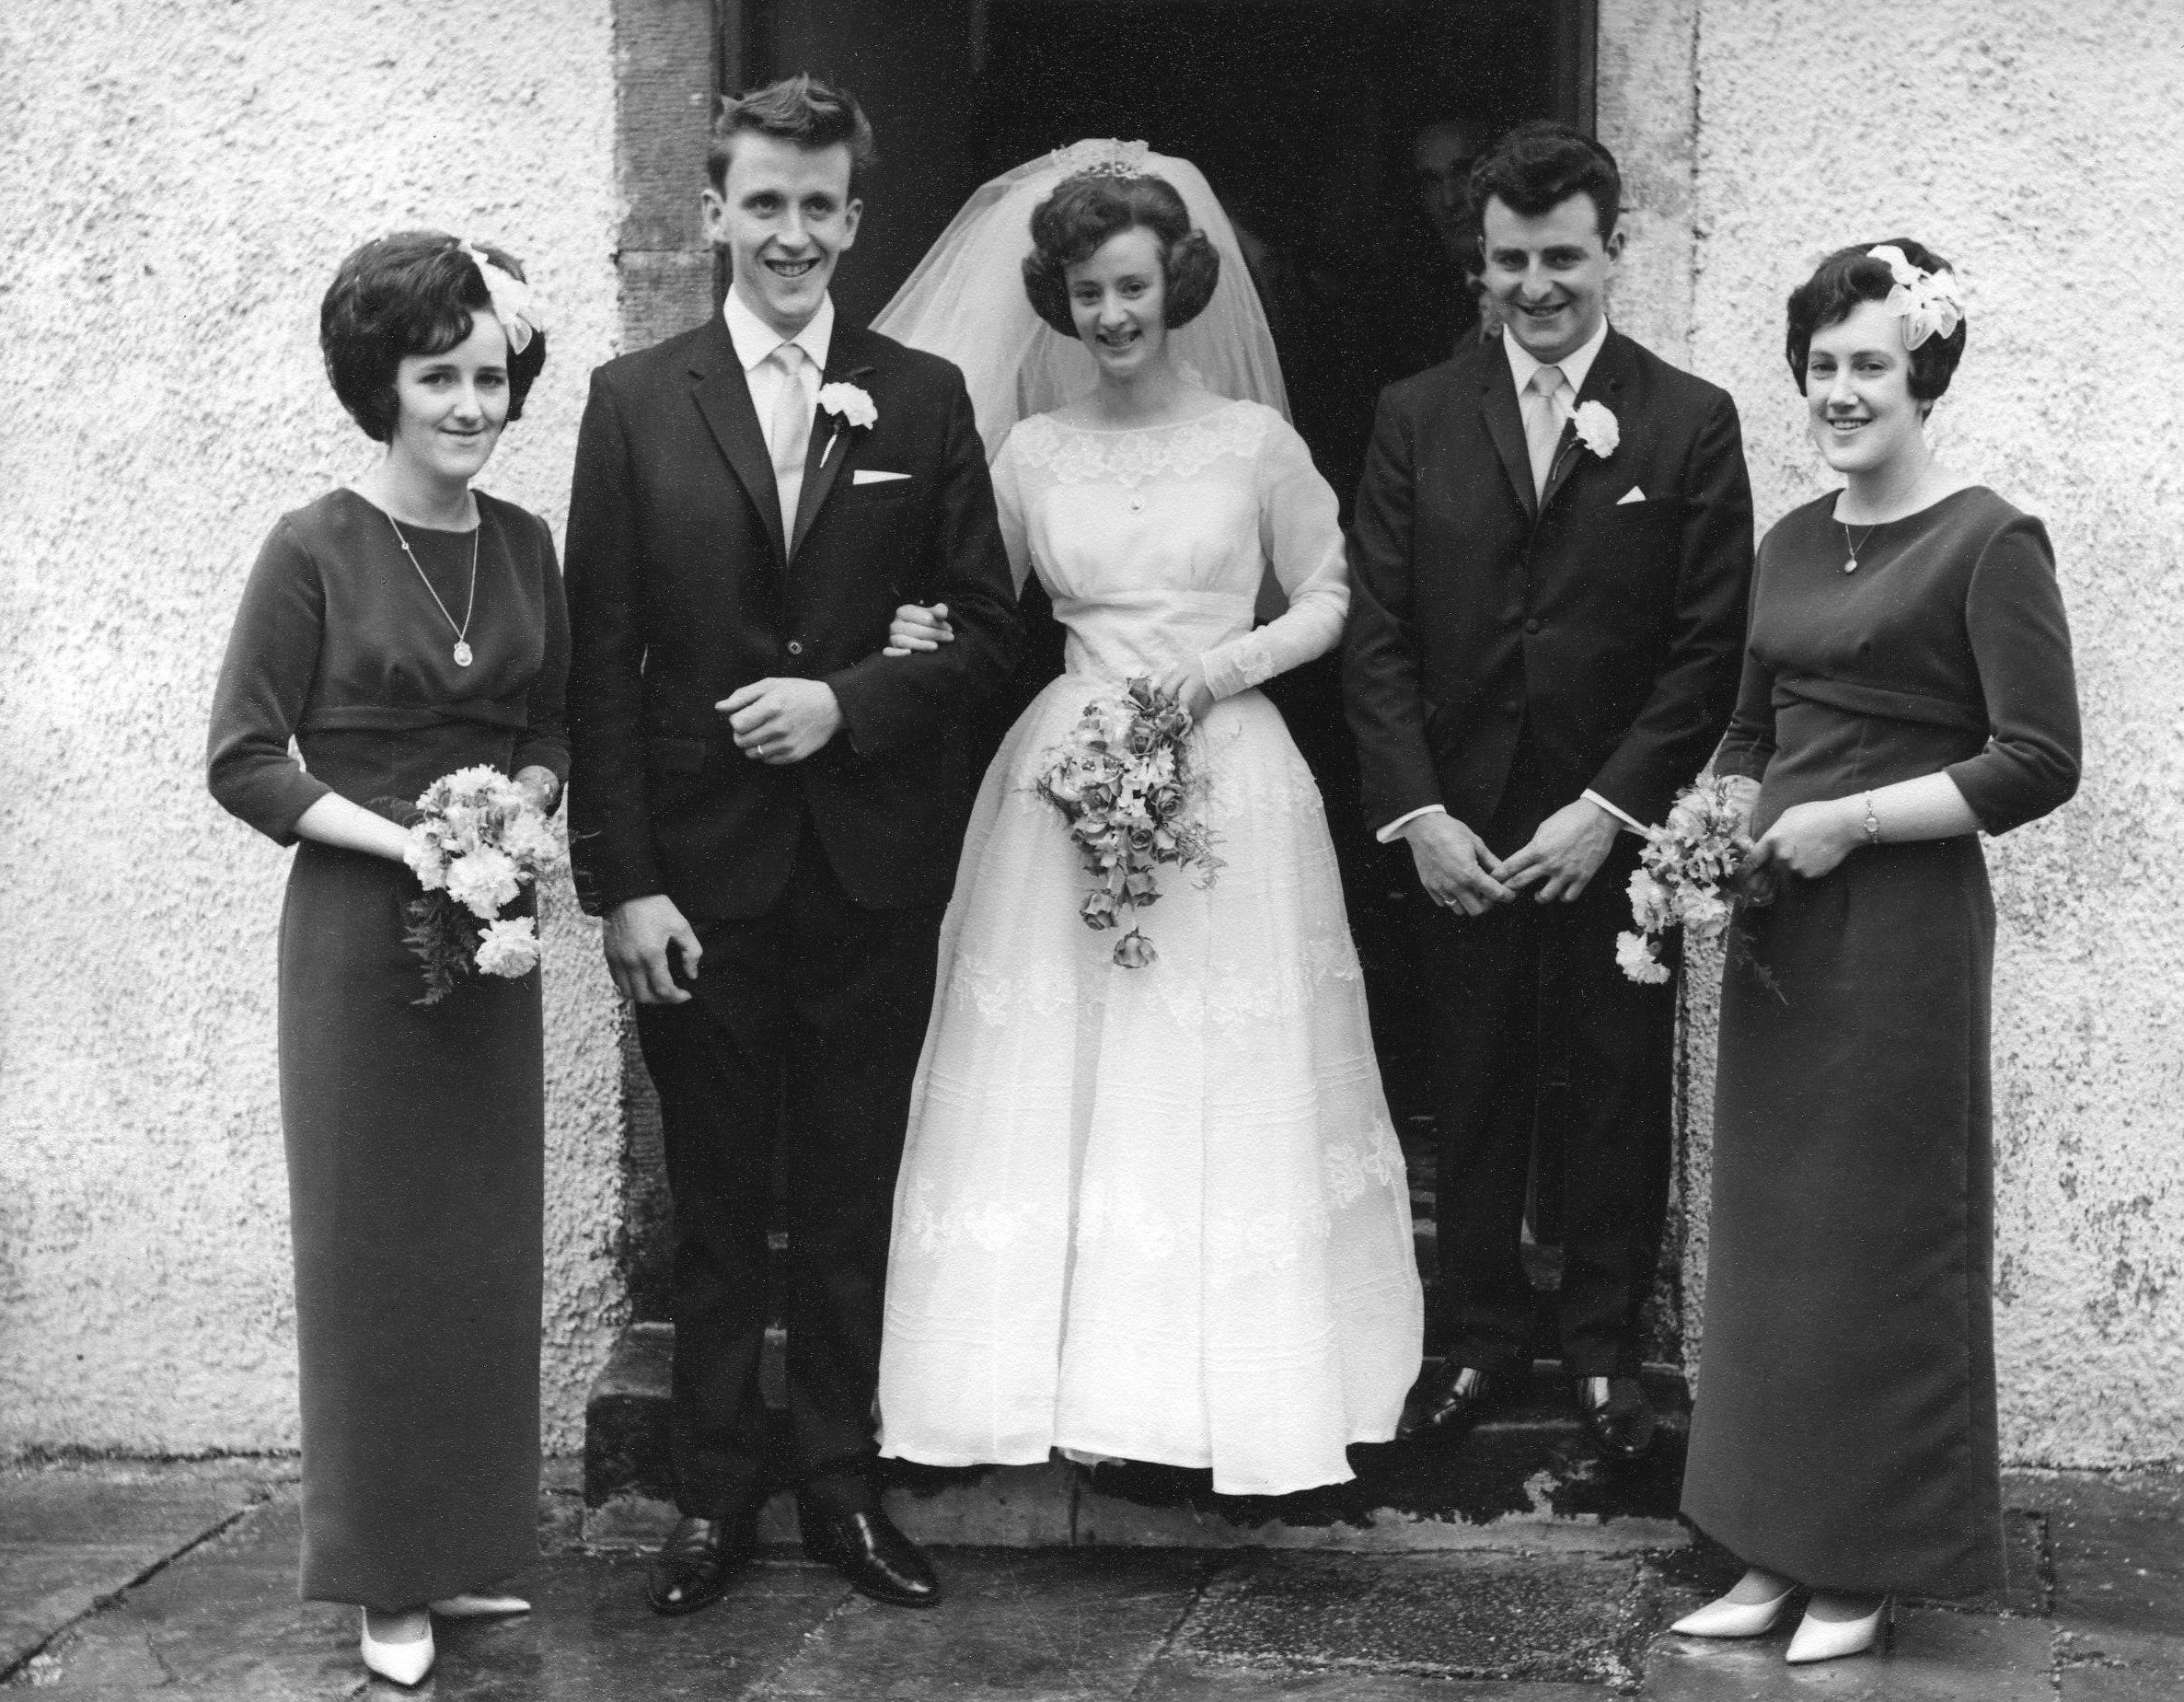 Ernie MacPherson & Irene Russel's Wedding